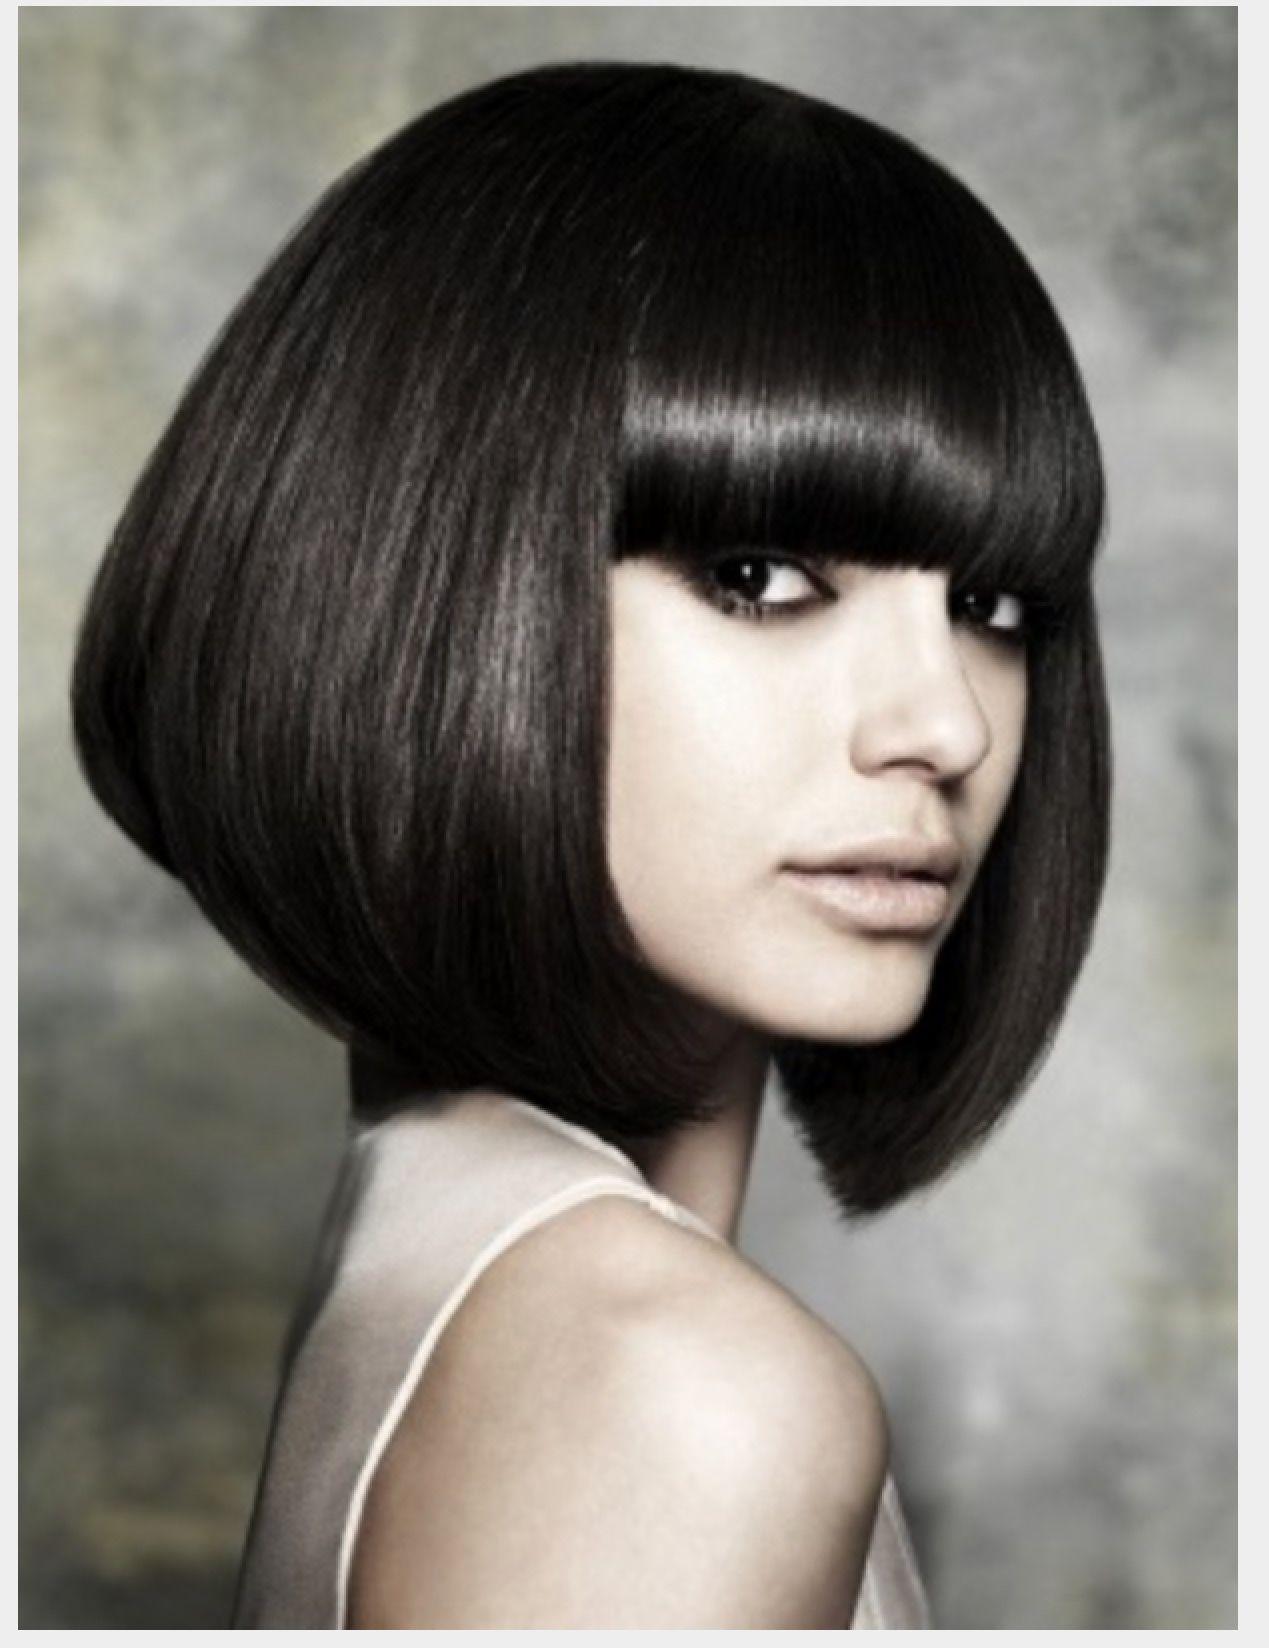 Pin By Melissa Costillo On Degree Haircut Pinterest Layered - Bob hairstyle names